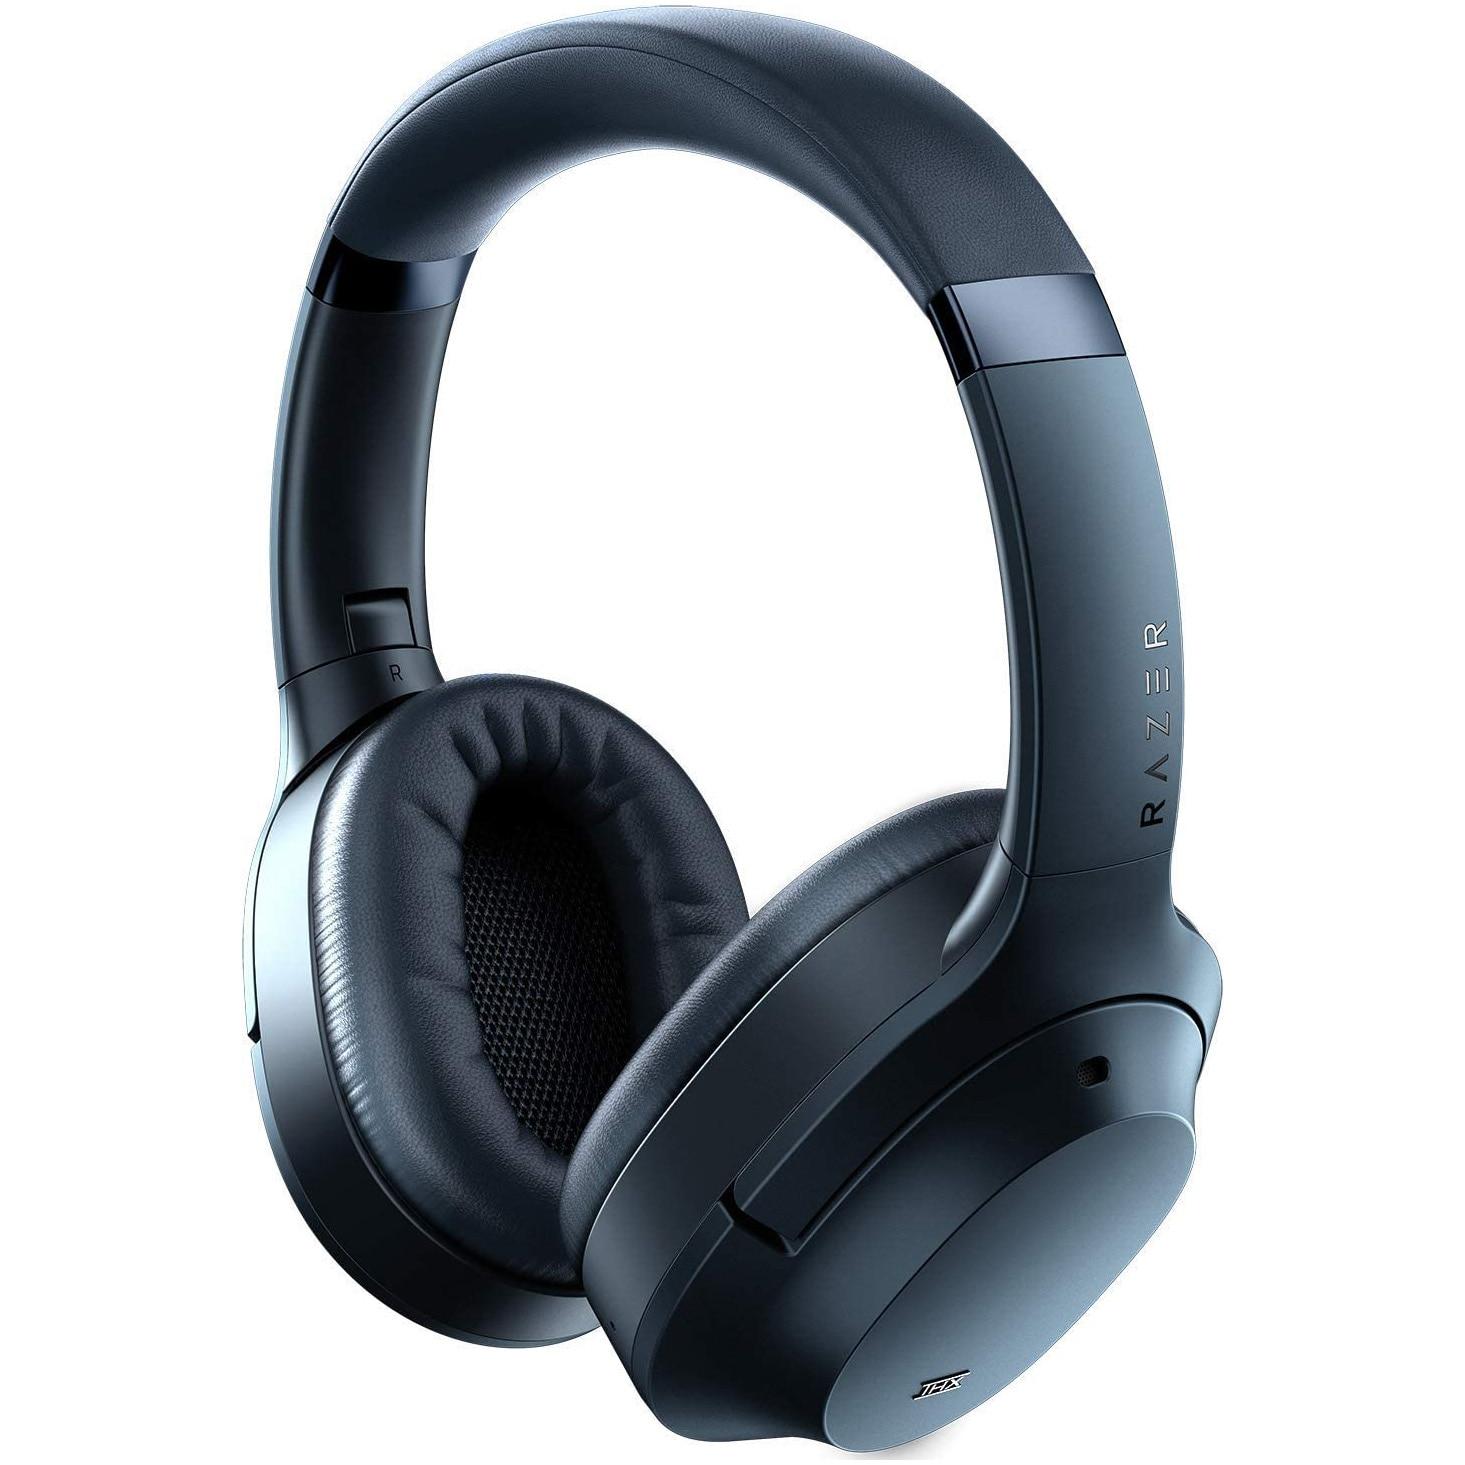 Fotografie Casti wireless Razer Opus, THX Certified, Advanced ANC, Bluetooth, USB-C, Midnight Blue